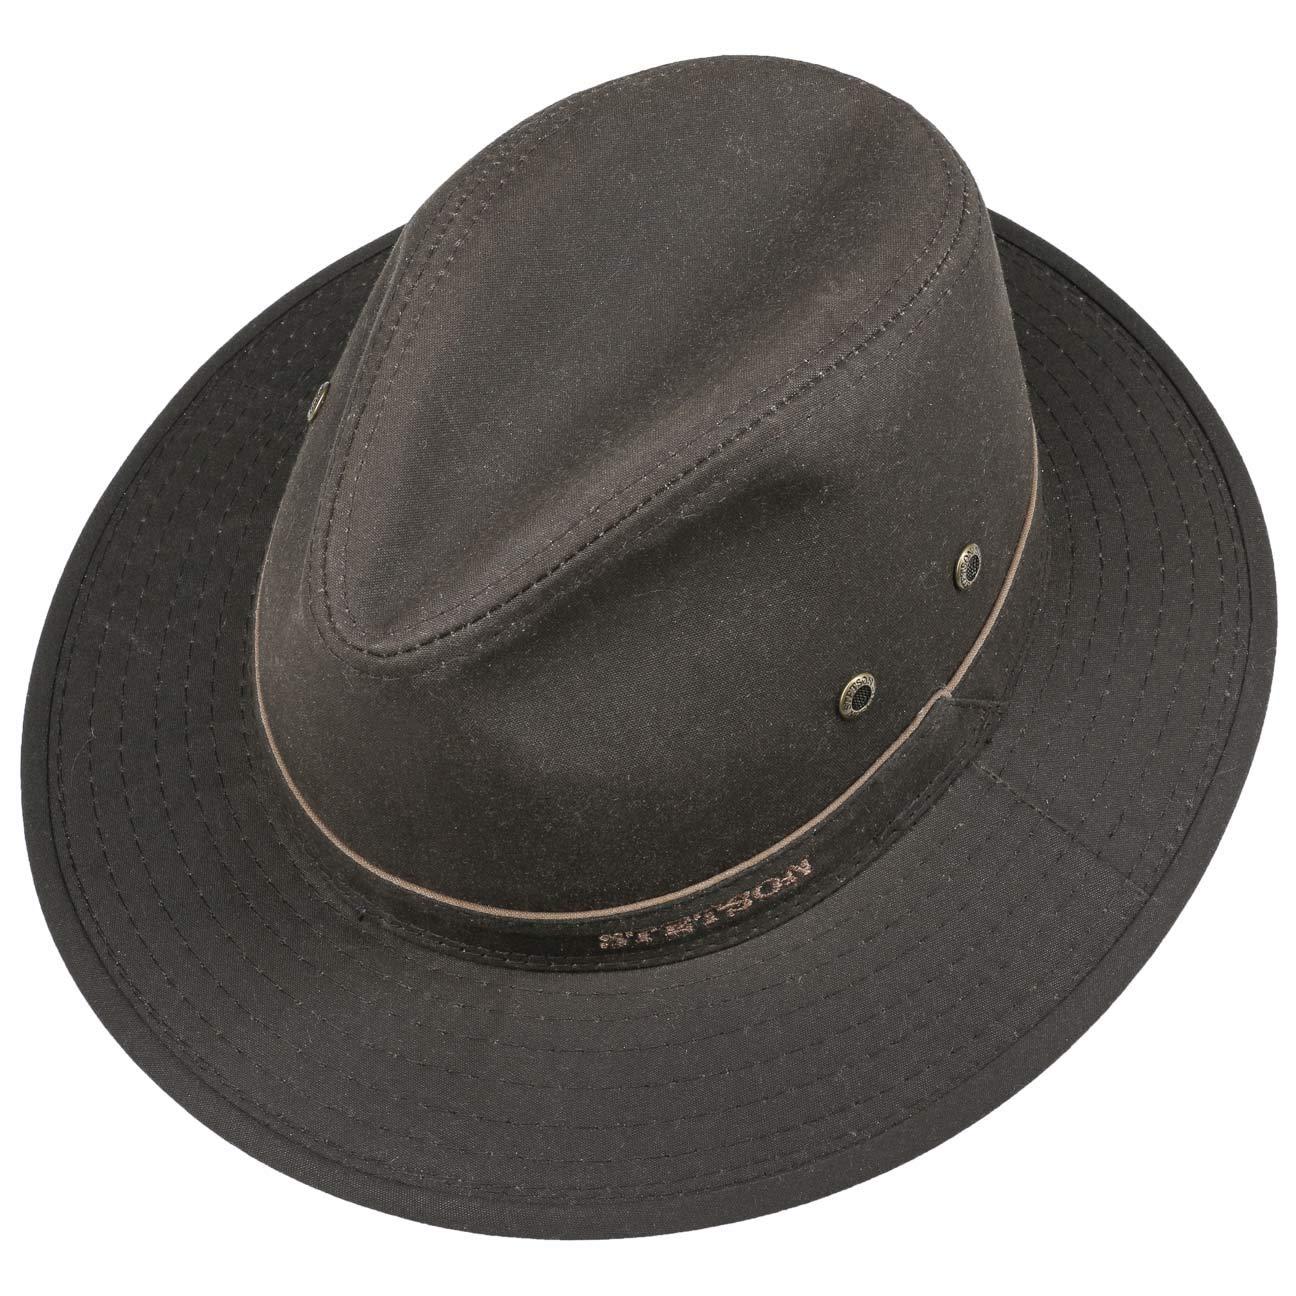 211aee858ba Stetson Avasun Waxed Cotton Traveller outdoor hat cloth  Amazon.co.uk   Clothing